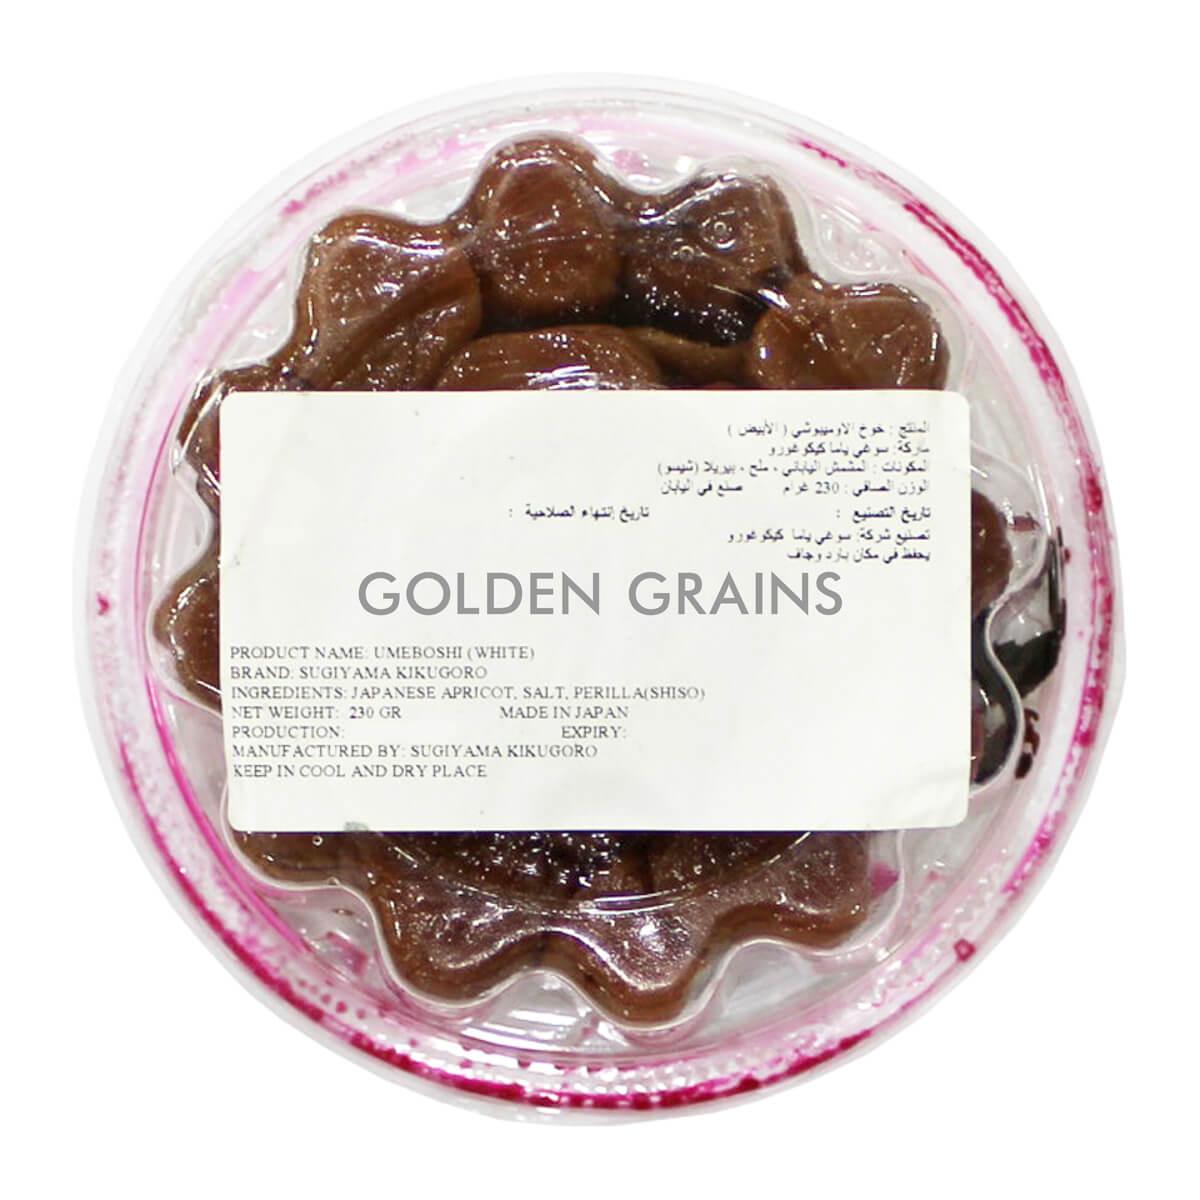 Golden Grains Okamoto - Half Dried Plums - Back.jpg